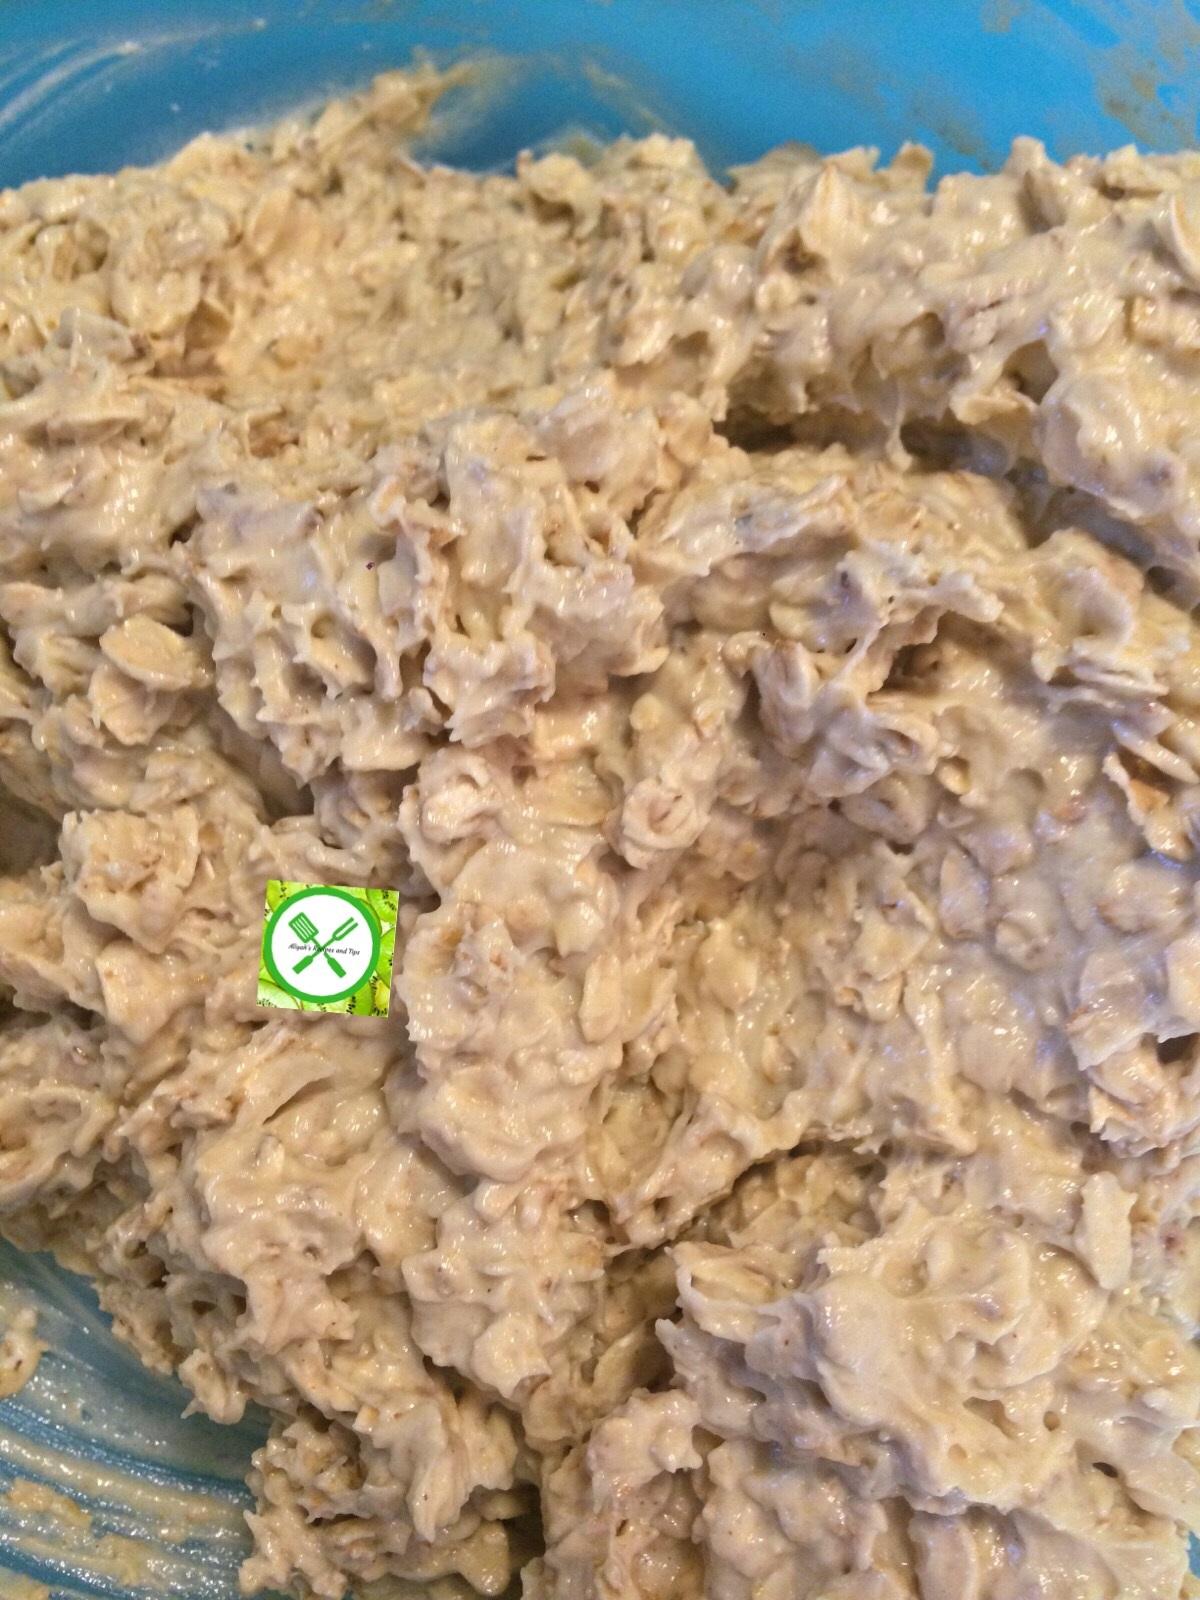 Oatmeal choco mixed